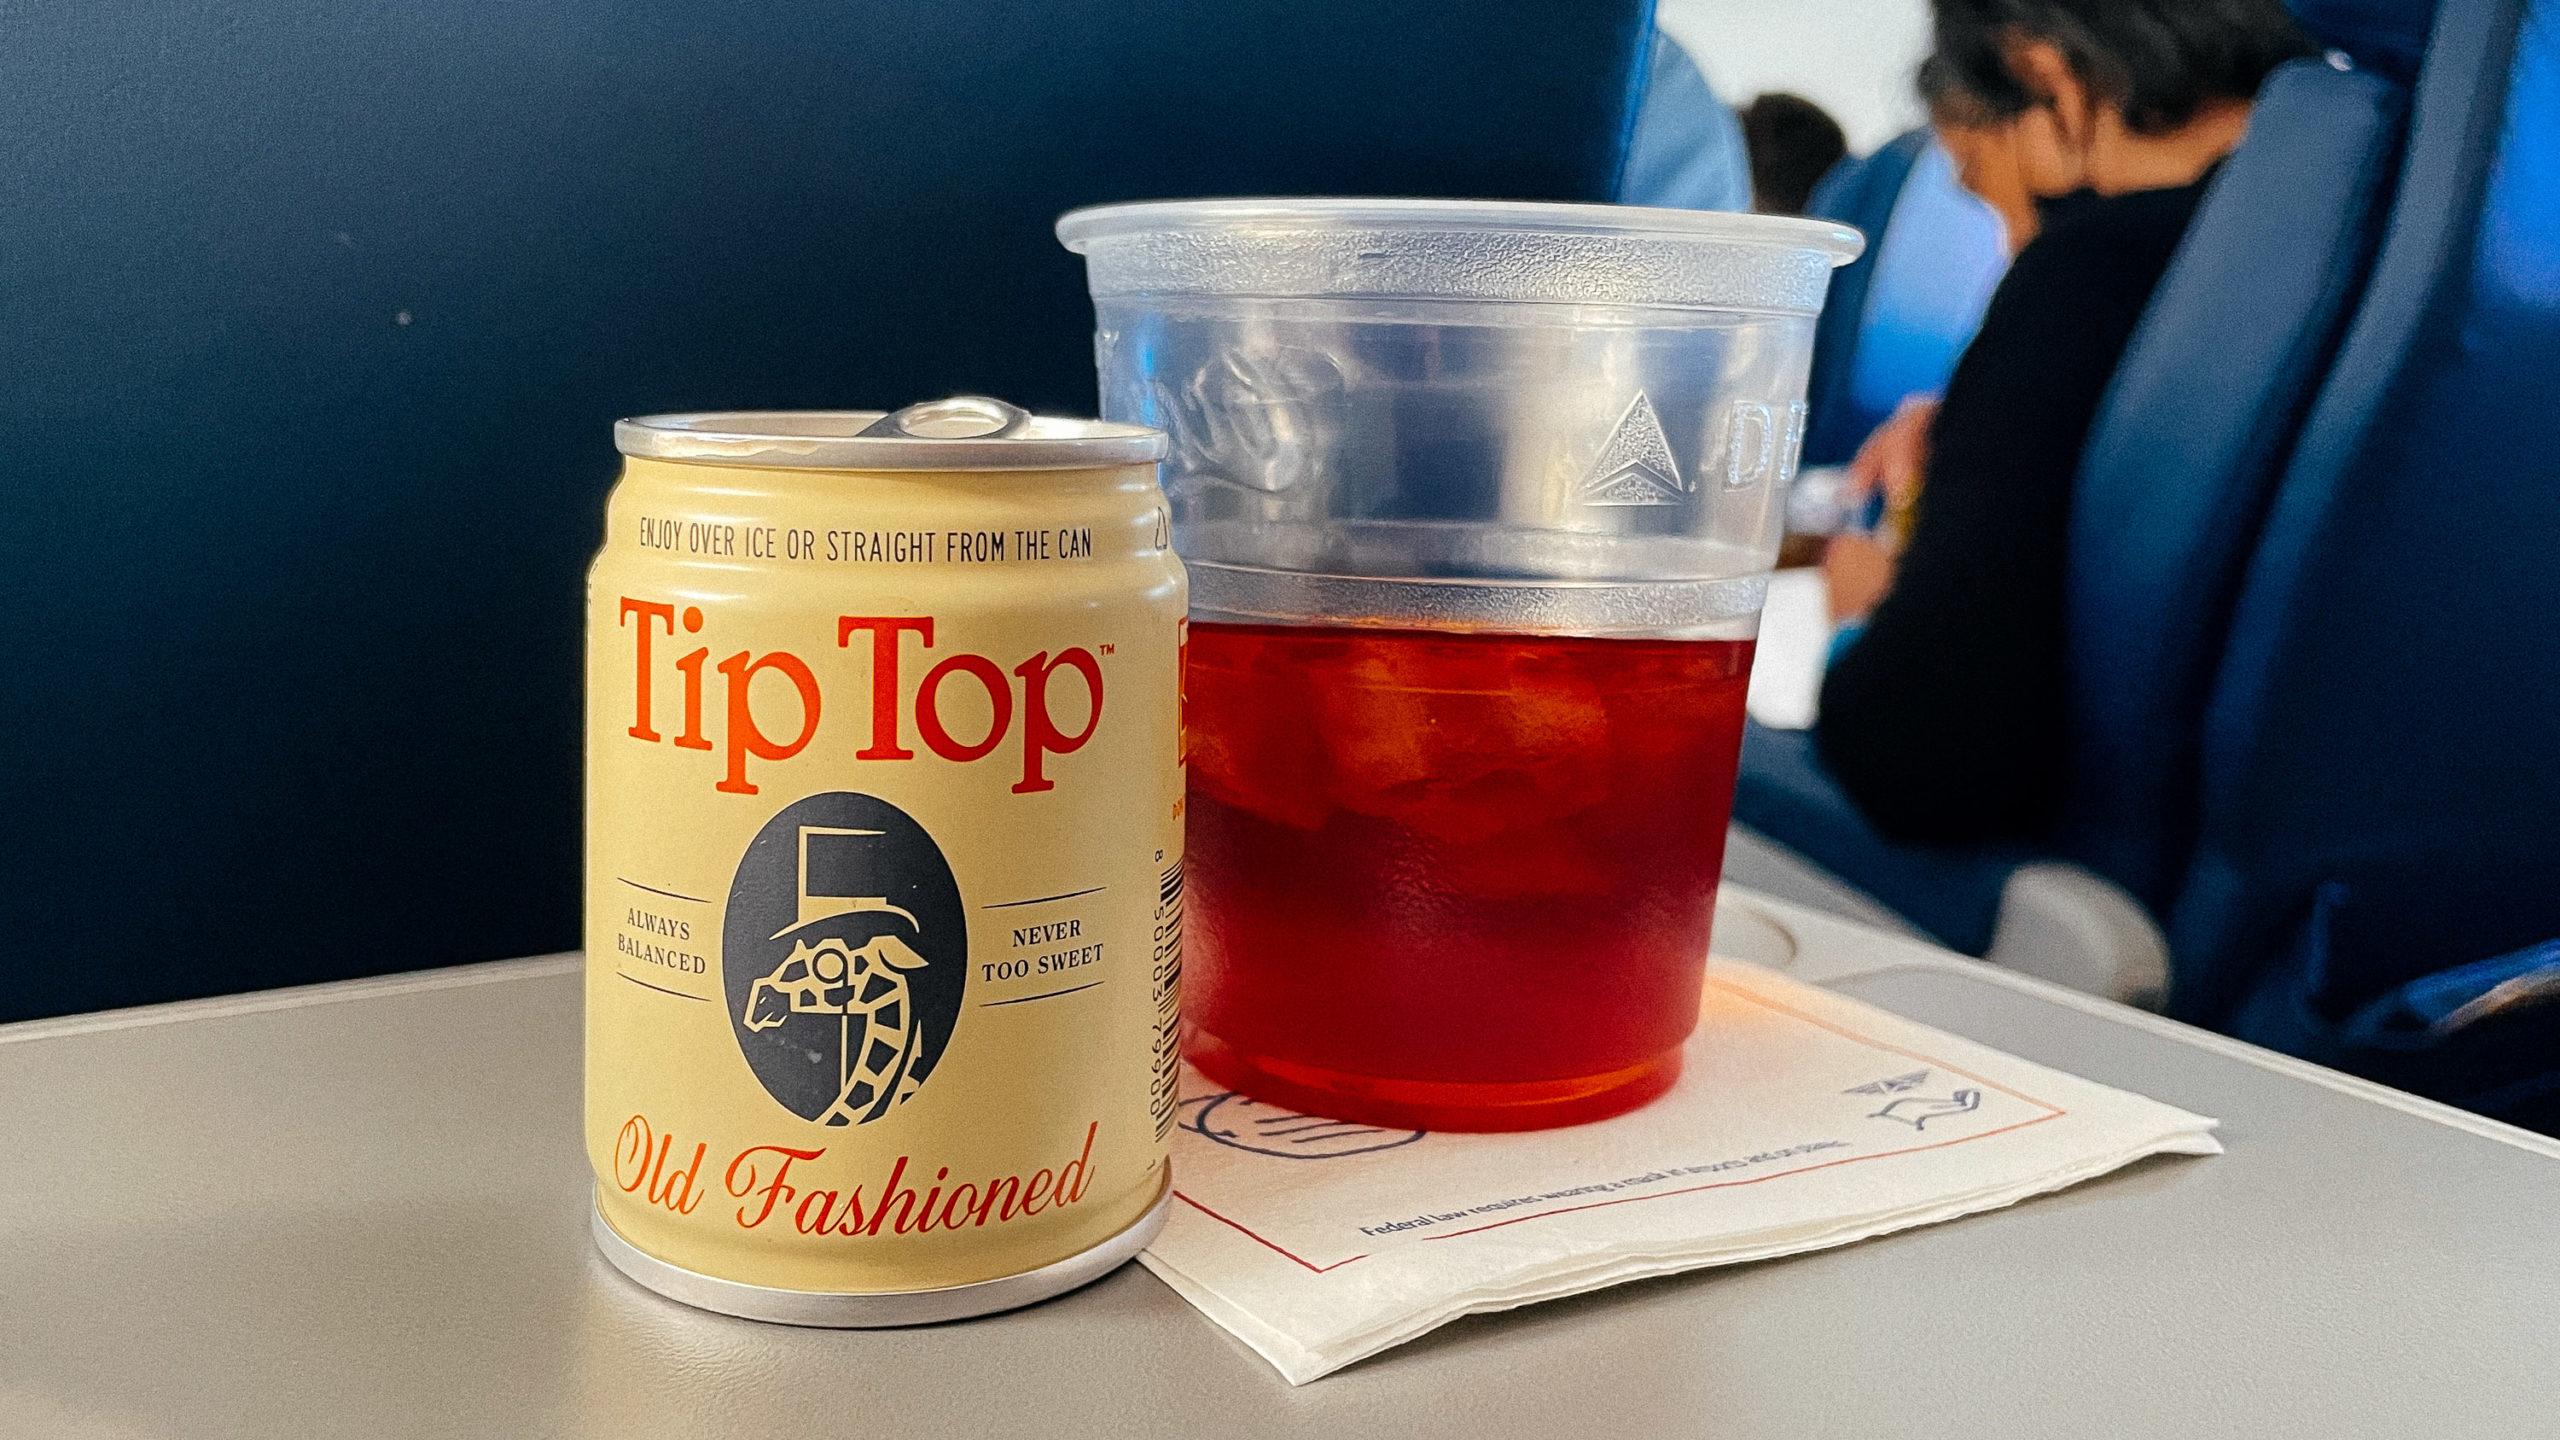 Tip Top cocktail